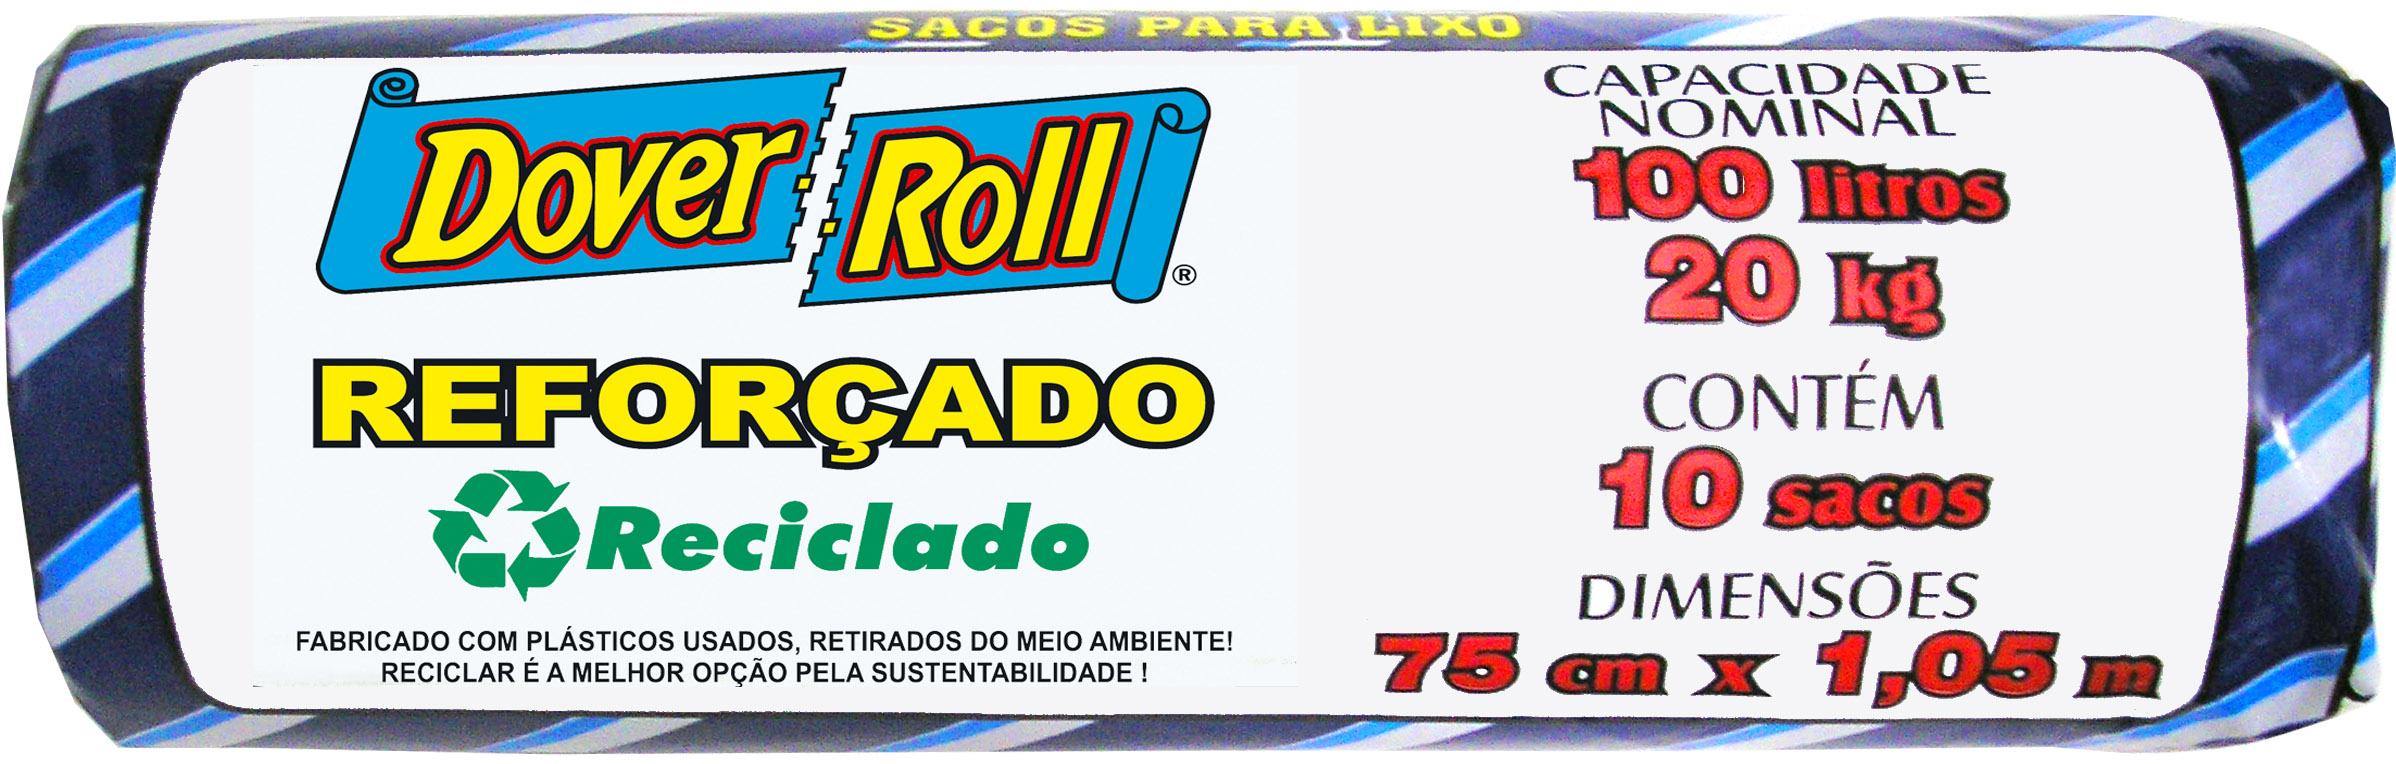 Saco para Lixo Dover-Roll Reforçado Reciclado 100L c/10